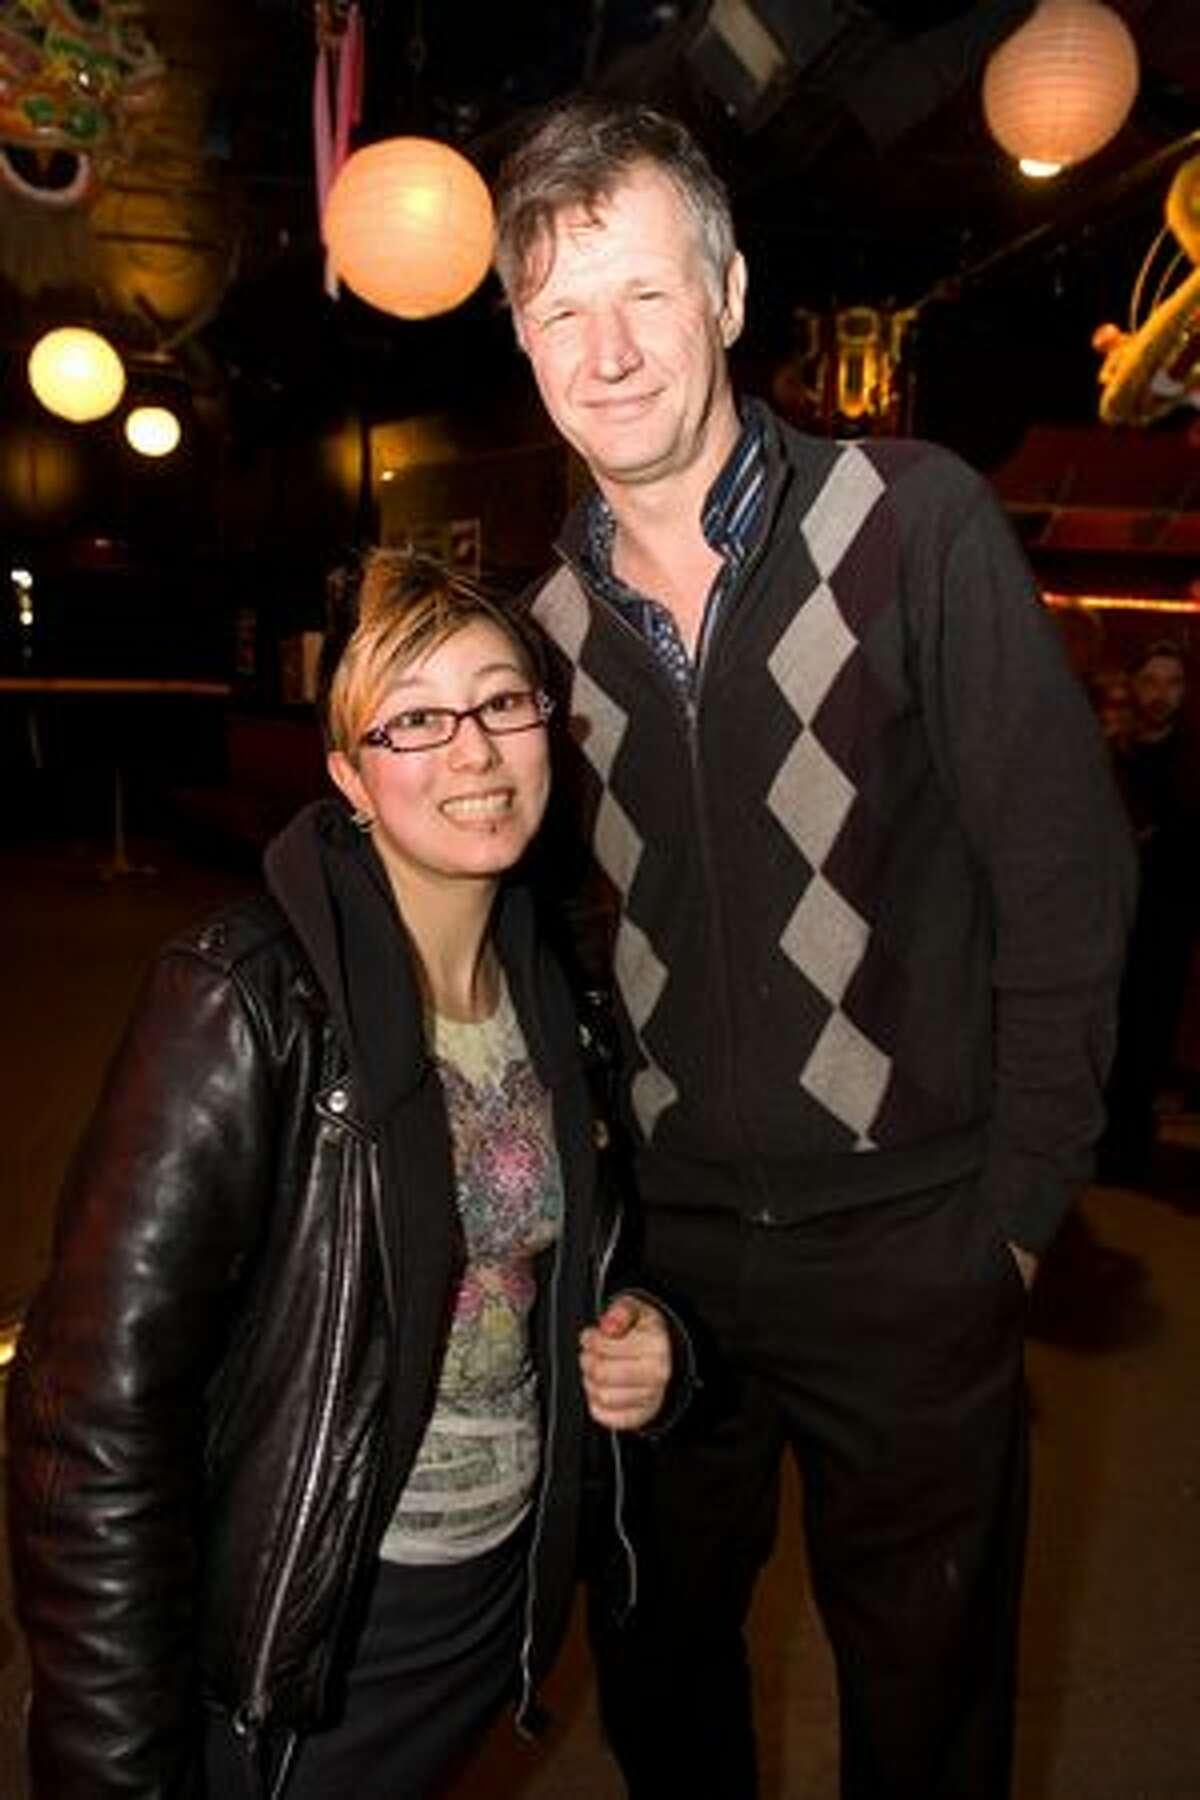 Jess Bateman and Steve Csutoras at Chop Suey's Laff Hole on March 3, 2010.